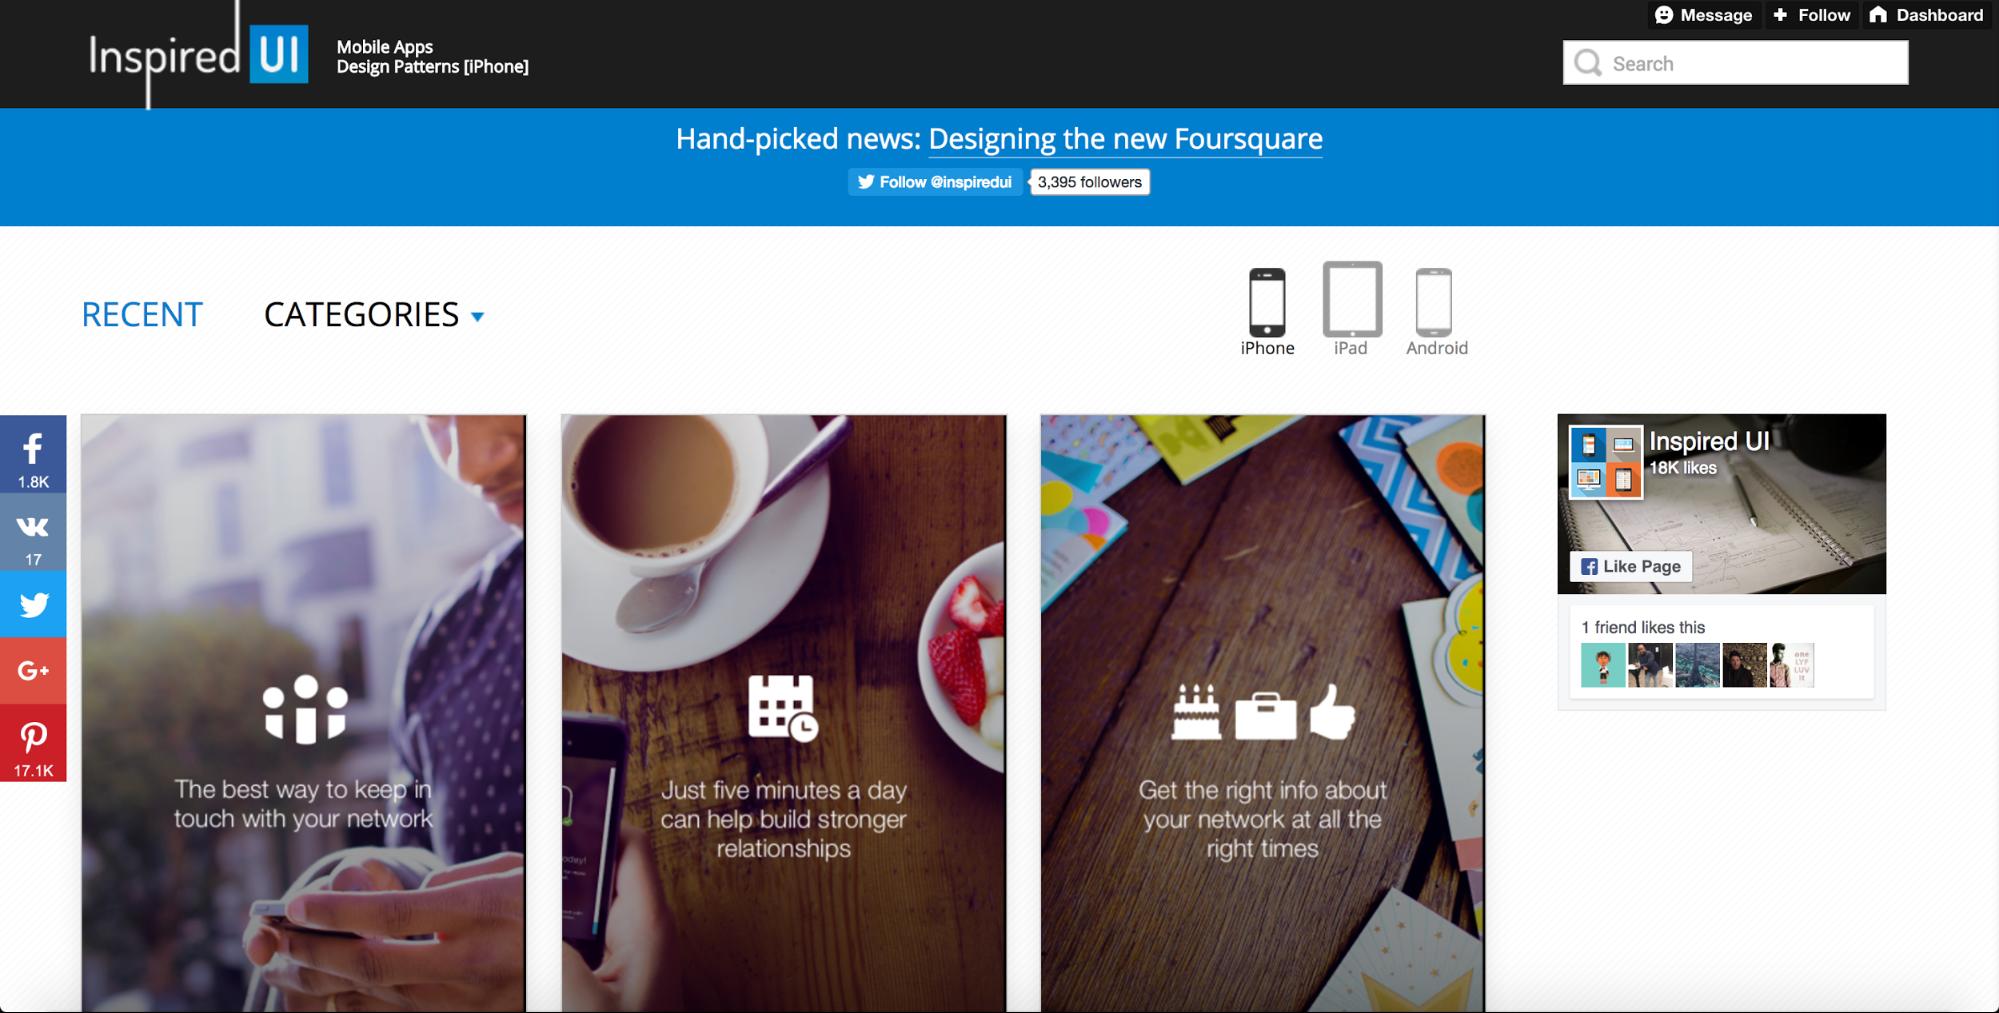 Inspired UI mobile design pattern site